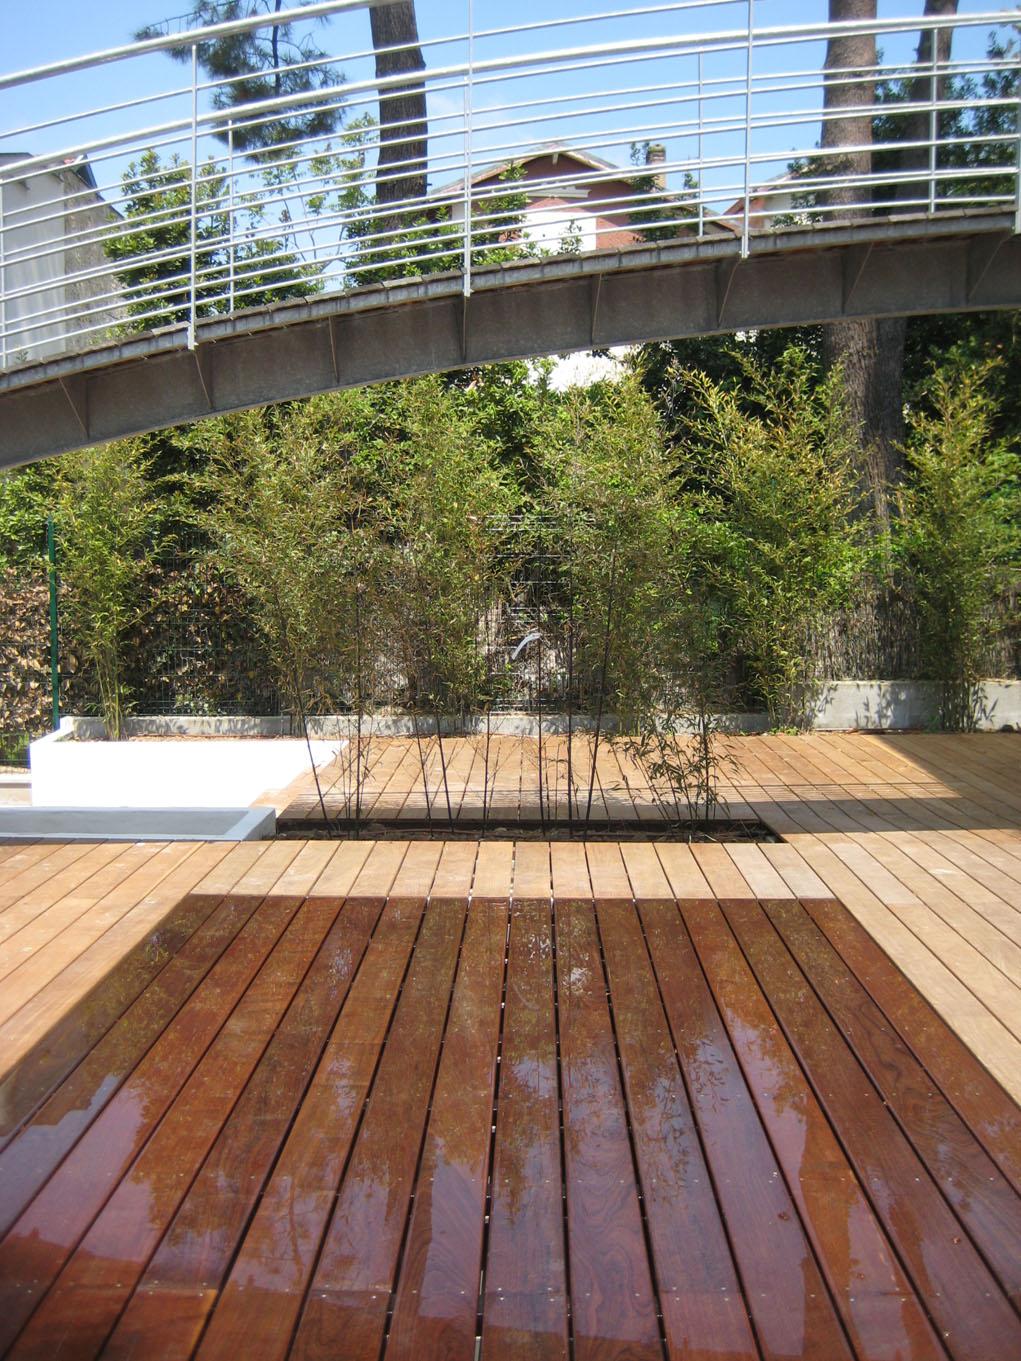 fond mobile de 200 300 kg m de charge fond mobile pour piscine hidden pool fond. Black Bedroom Furniture Sets. Home Design Ideas